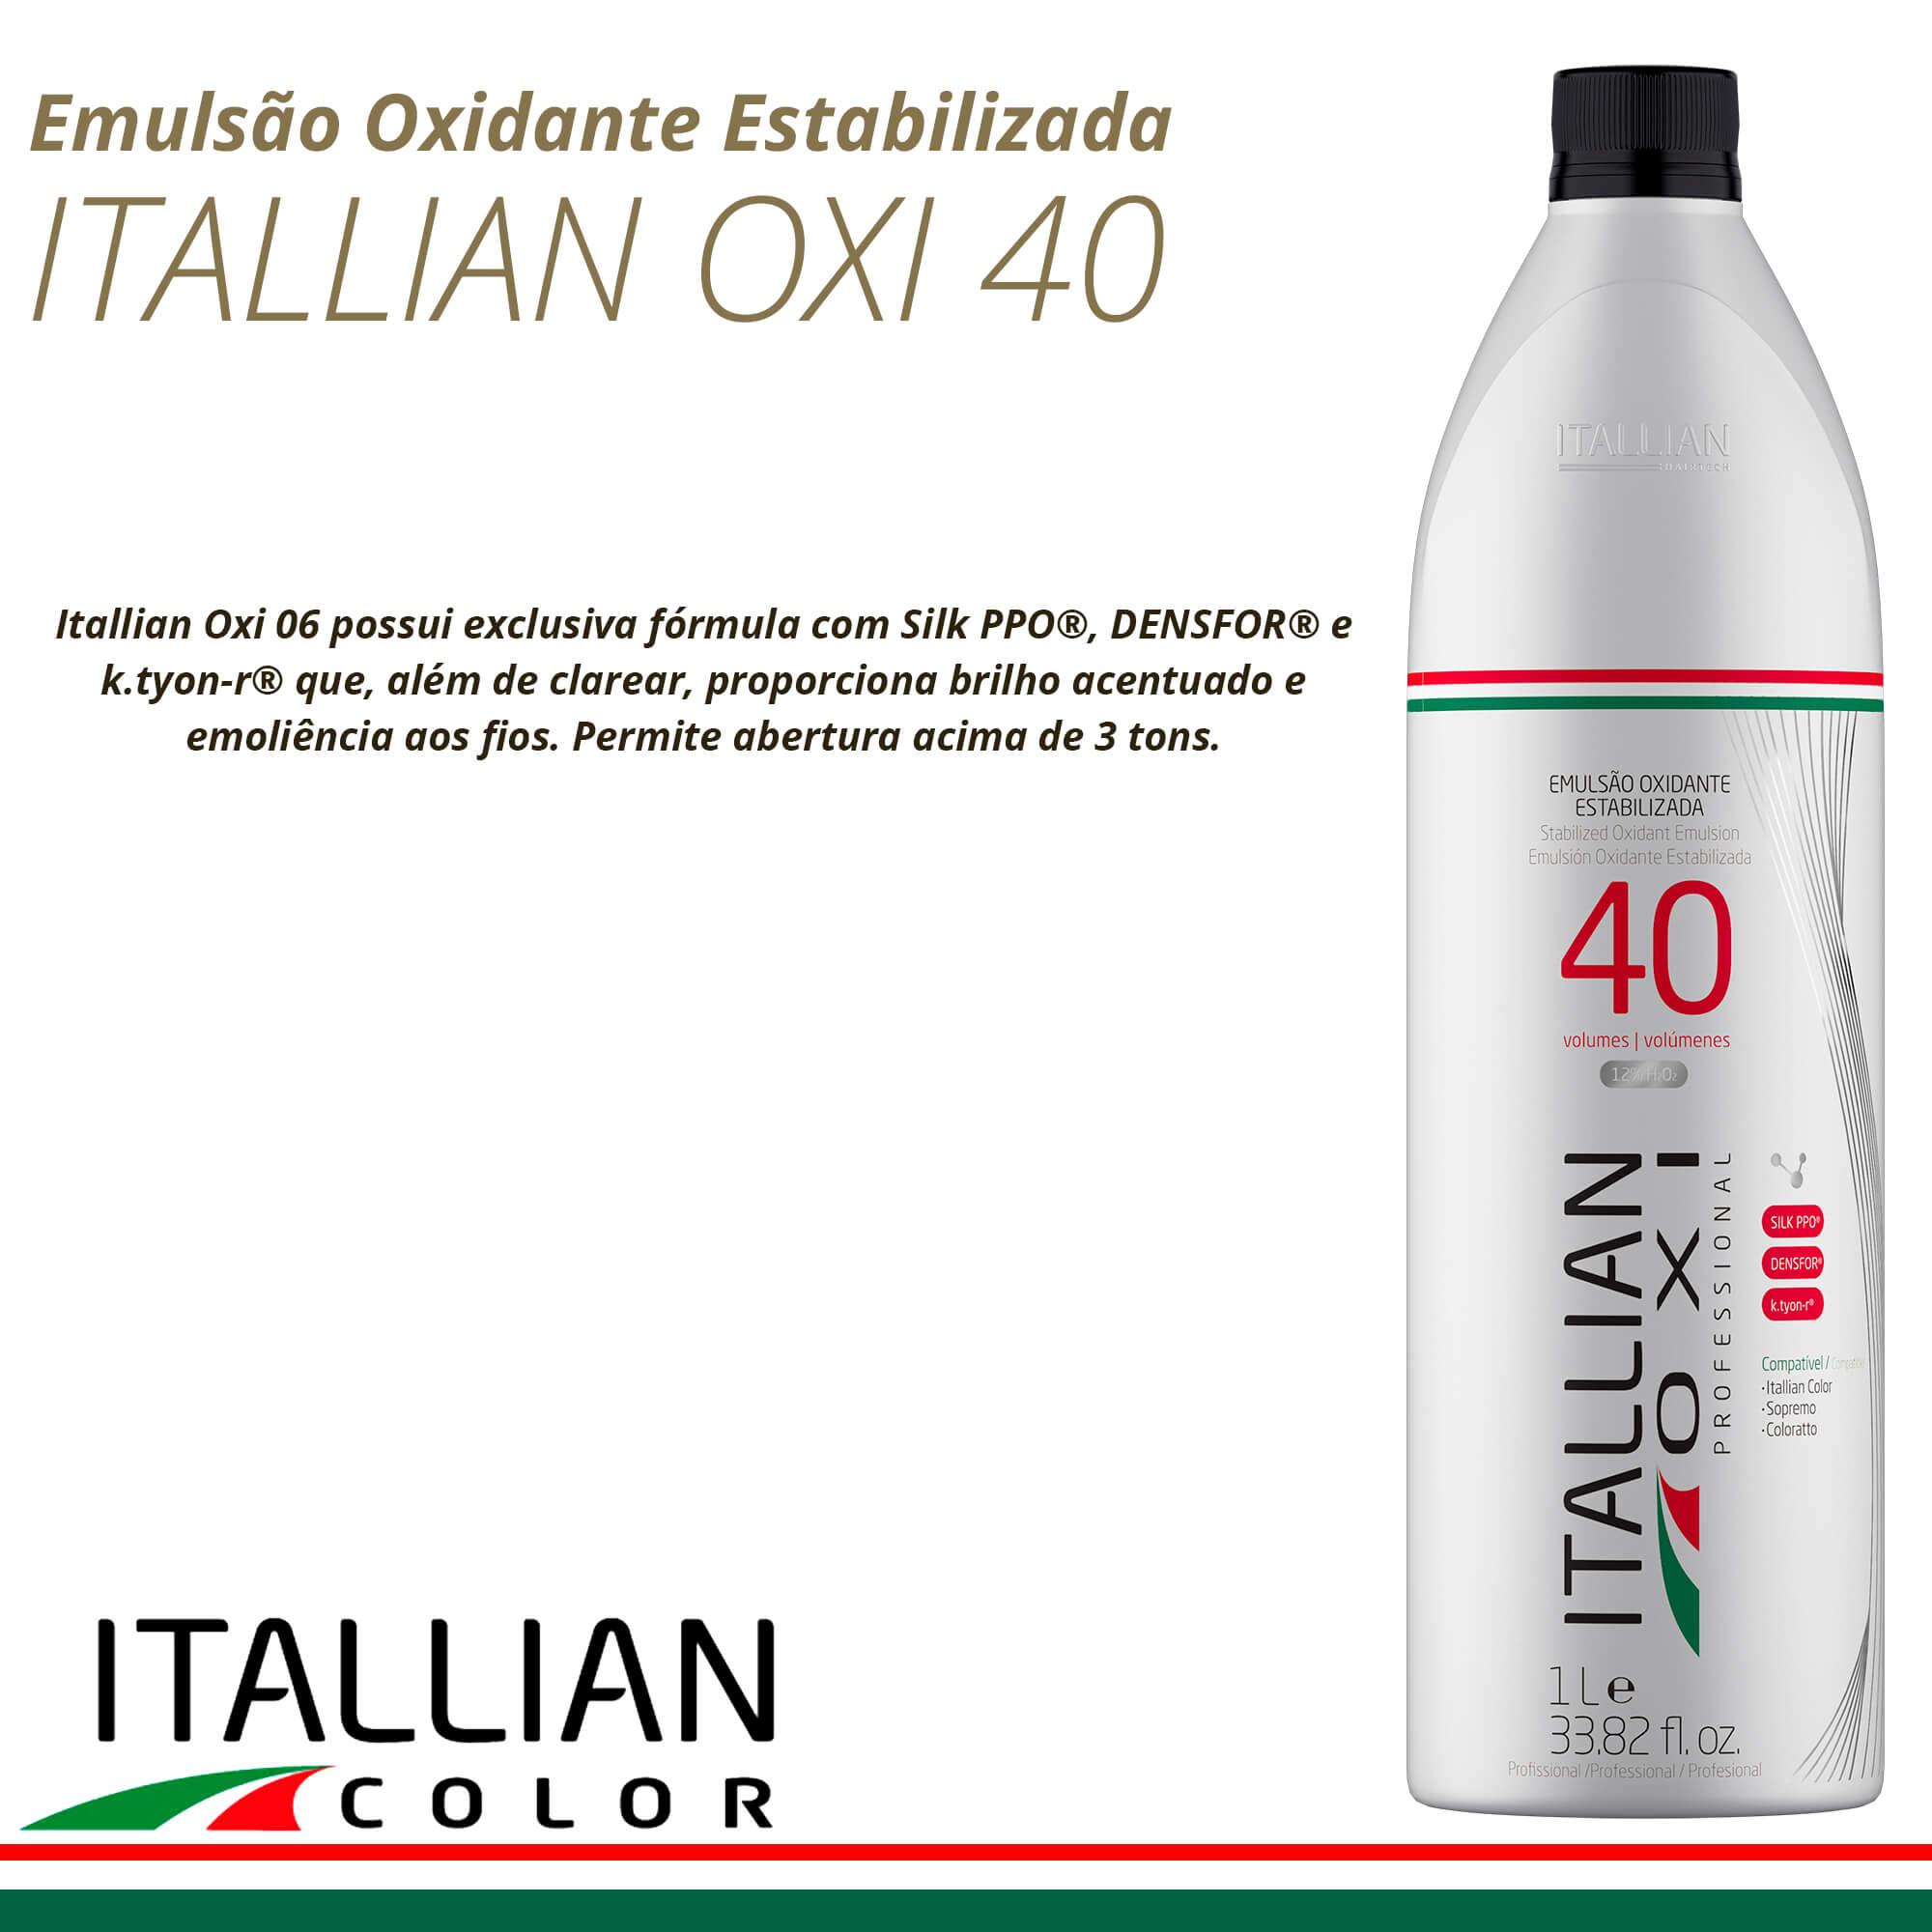 Emulsão Oxidante Estabilizada Itallian Oxi 40 Volumes 1l